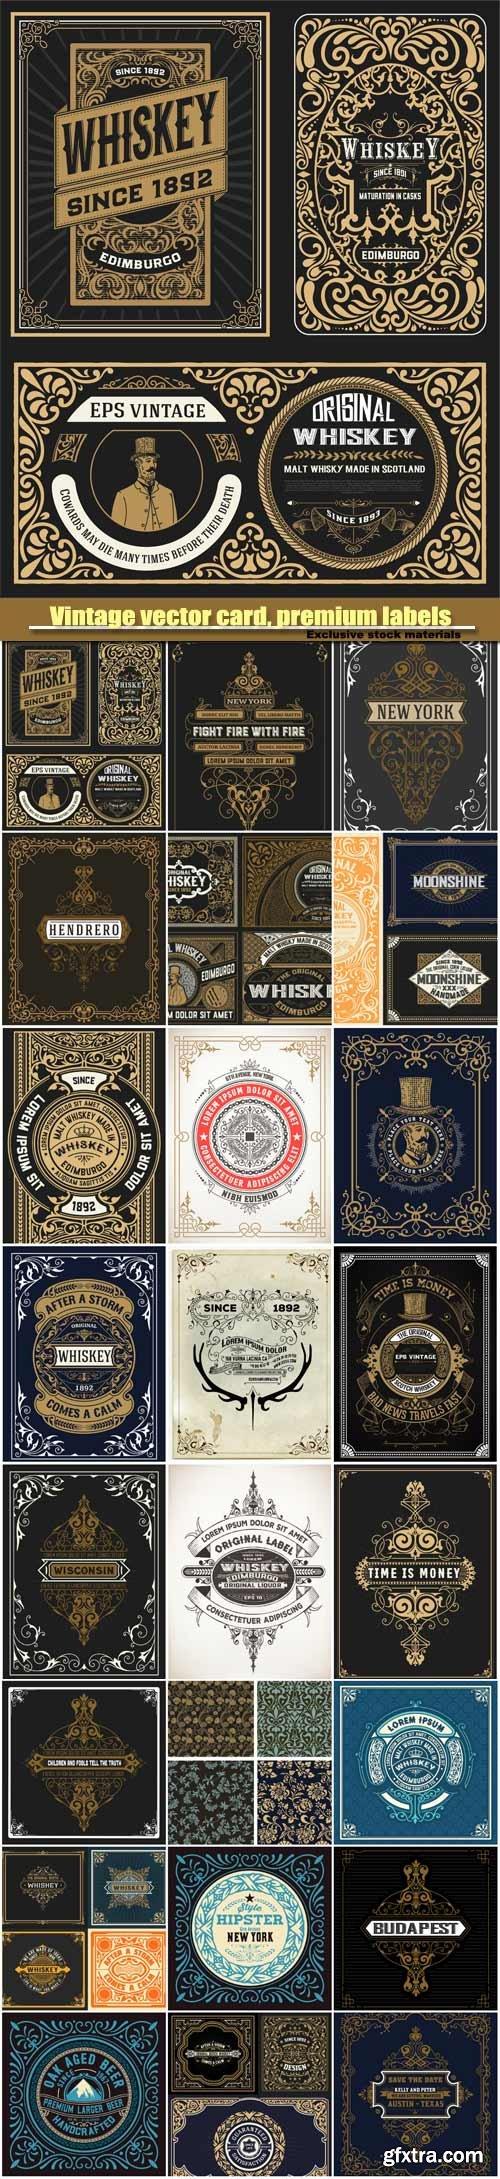 Vintage vector card, premium labels, vintage ornaments